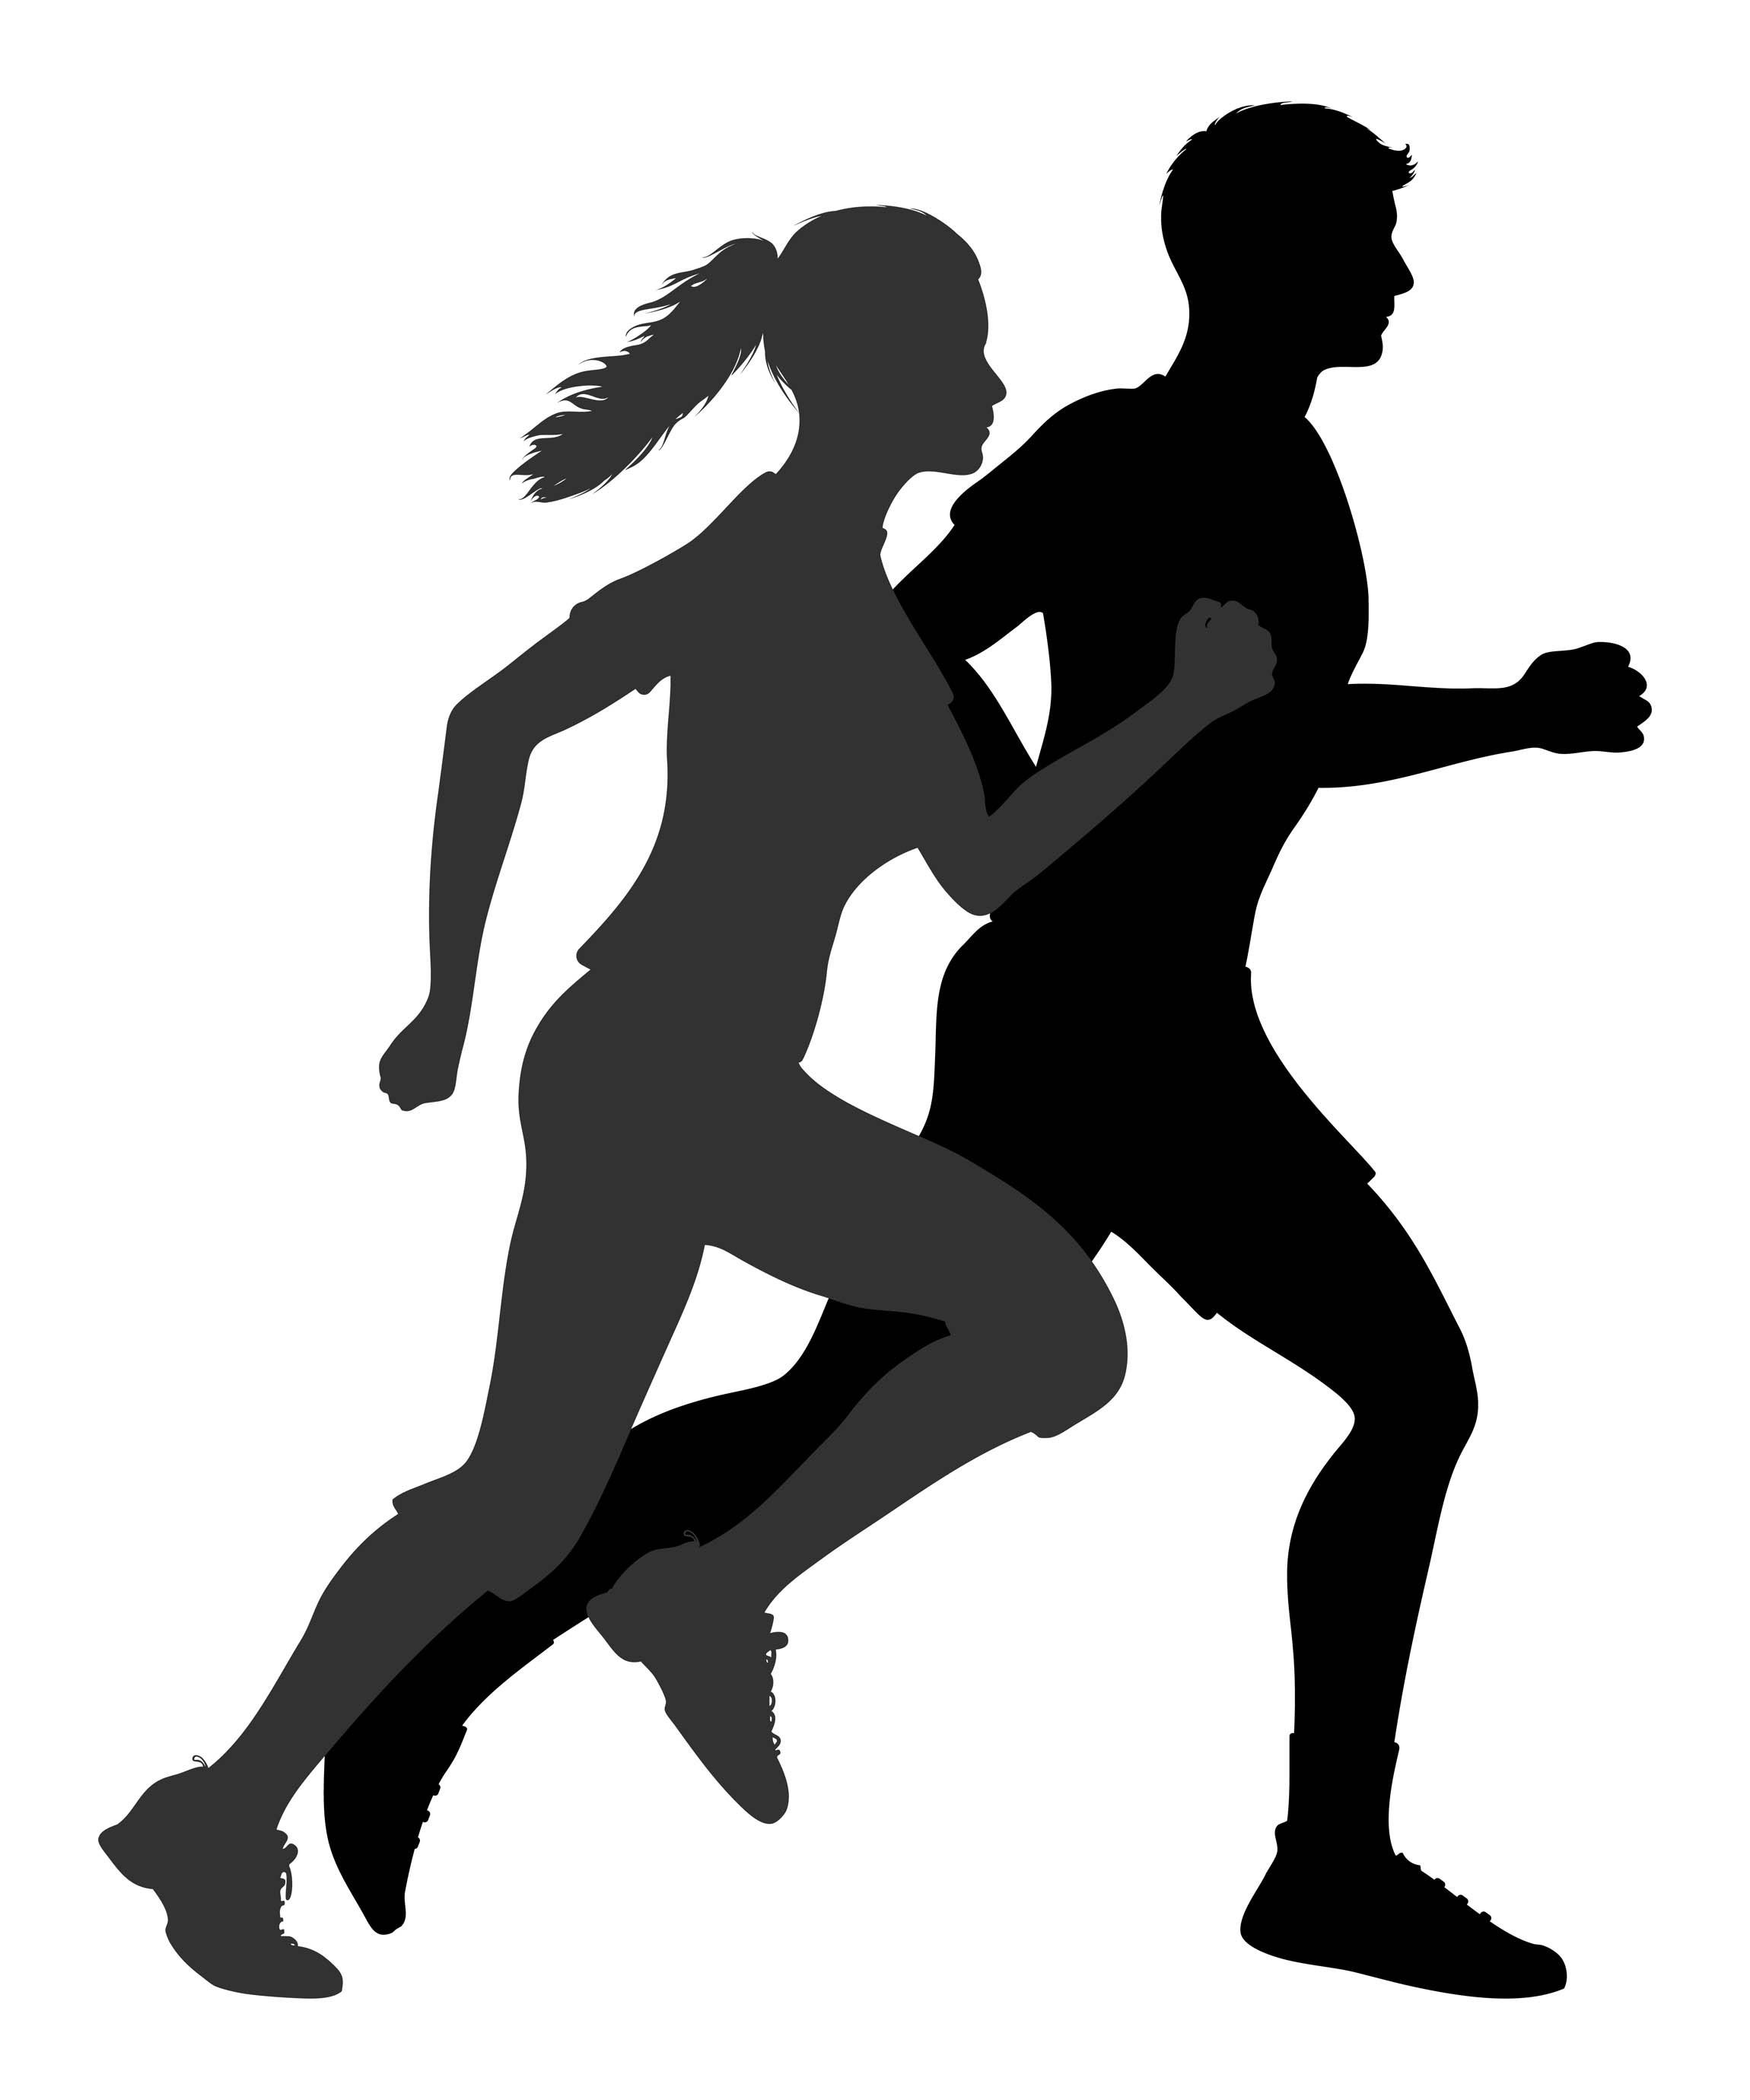 Free runner clipart 2 » Clipart Portal.